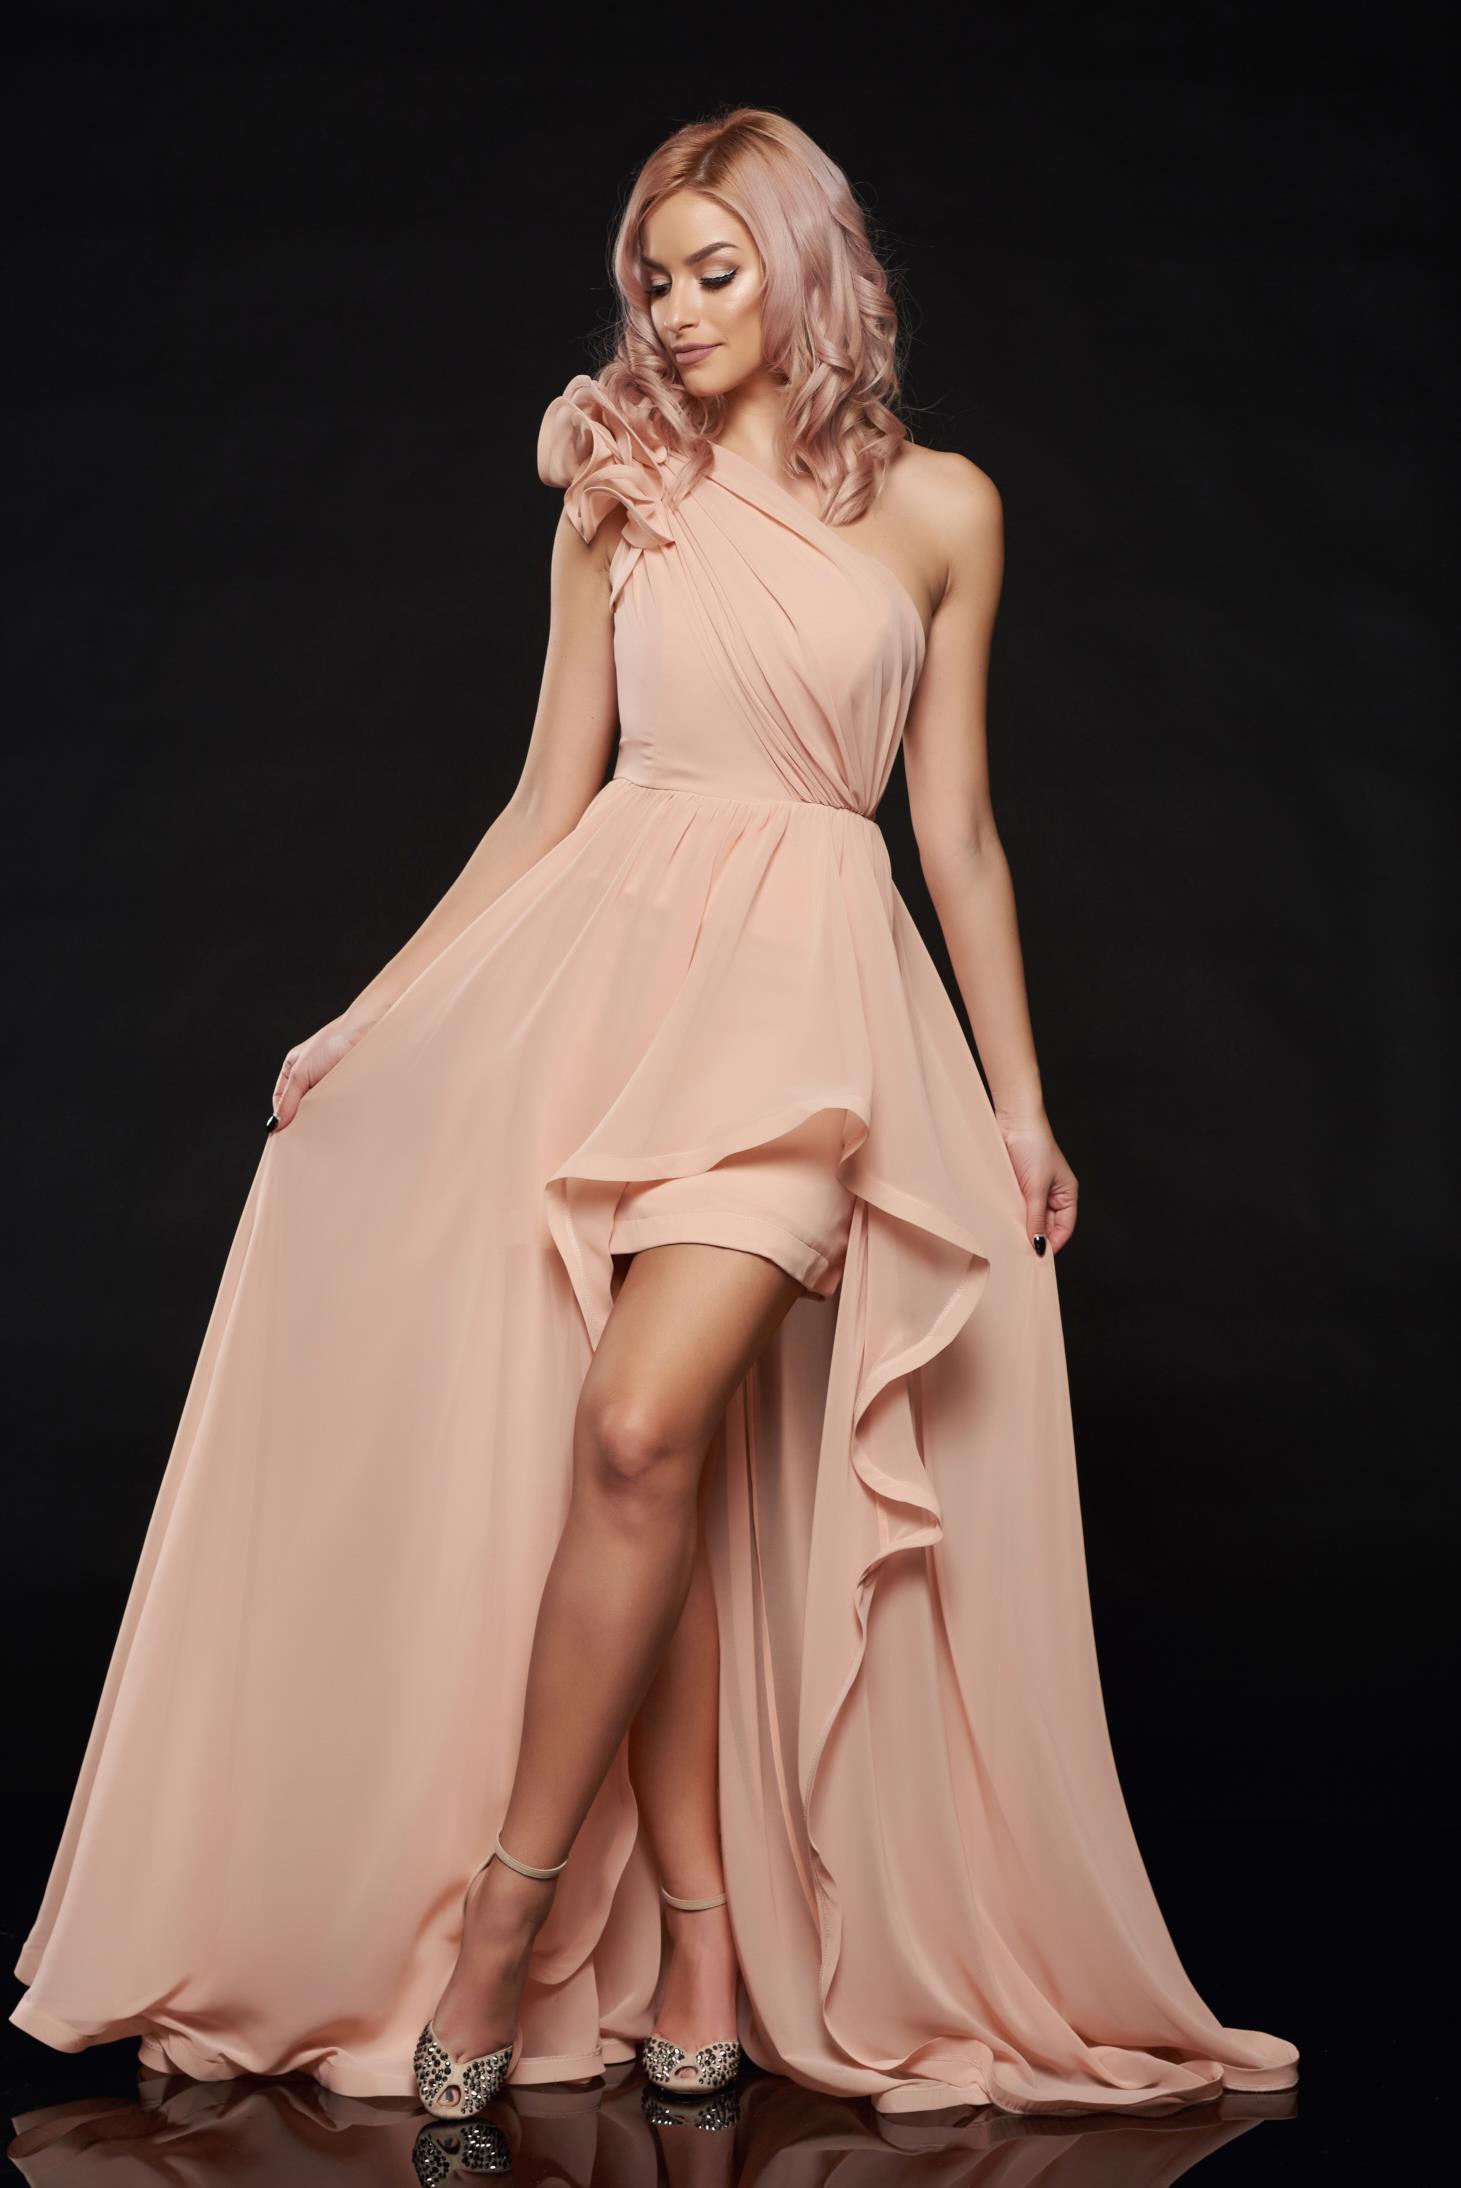 Ana Radu Angelic Look Peach Dress